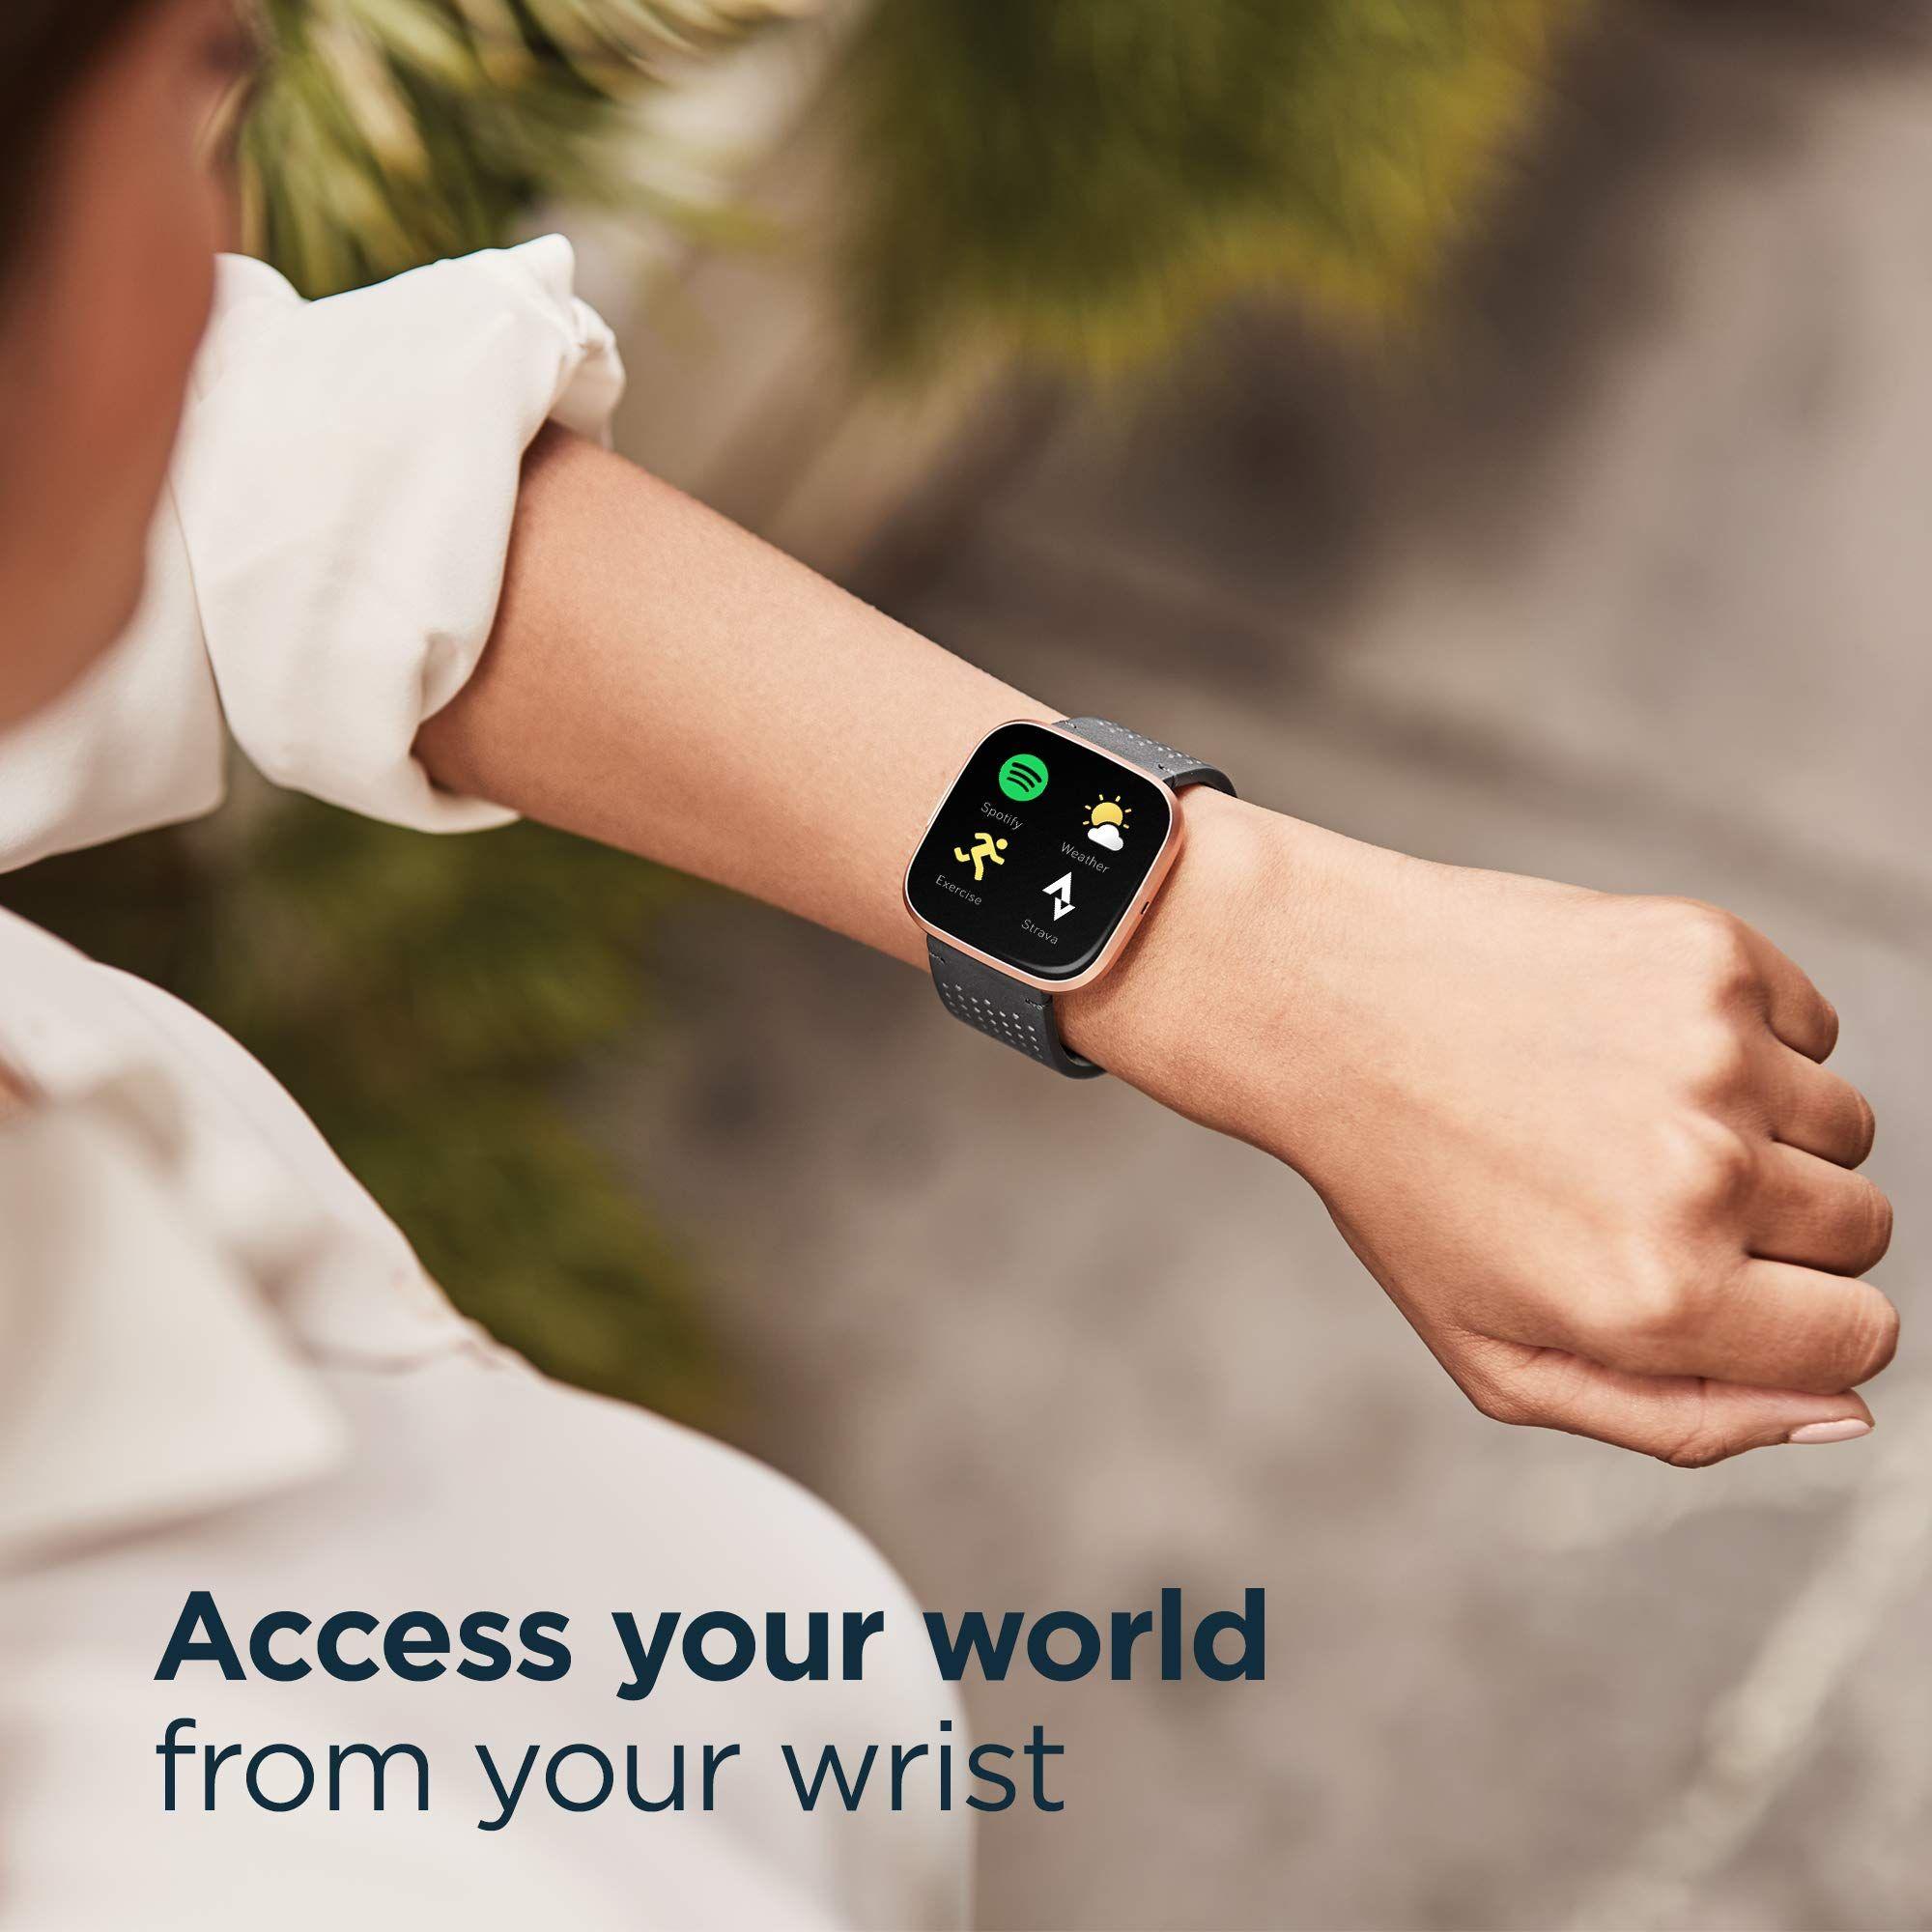 images?q=tbn:ANd9GcQh_l3eQ5xwiPy07kGEXjmjgmBKBRB7H2mRxCGhv1tFWg5c_mWT Smart Watch Amazon Nl